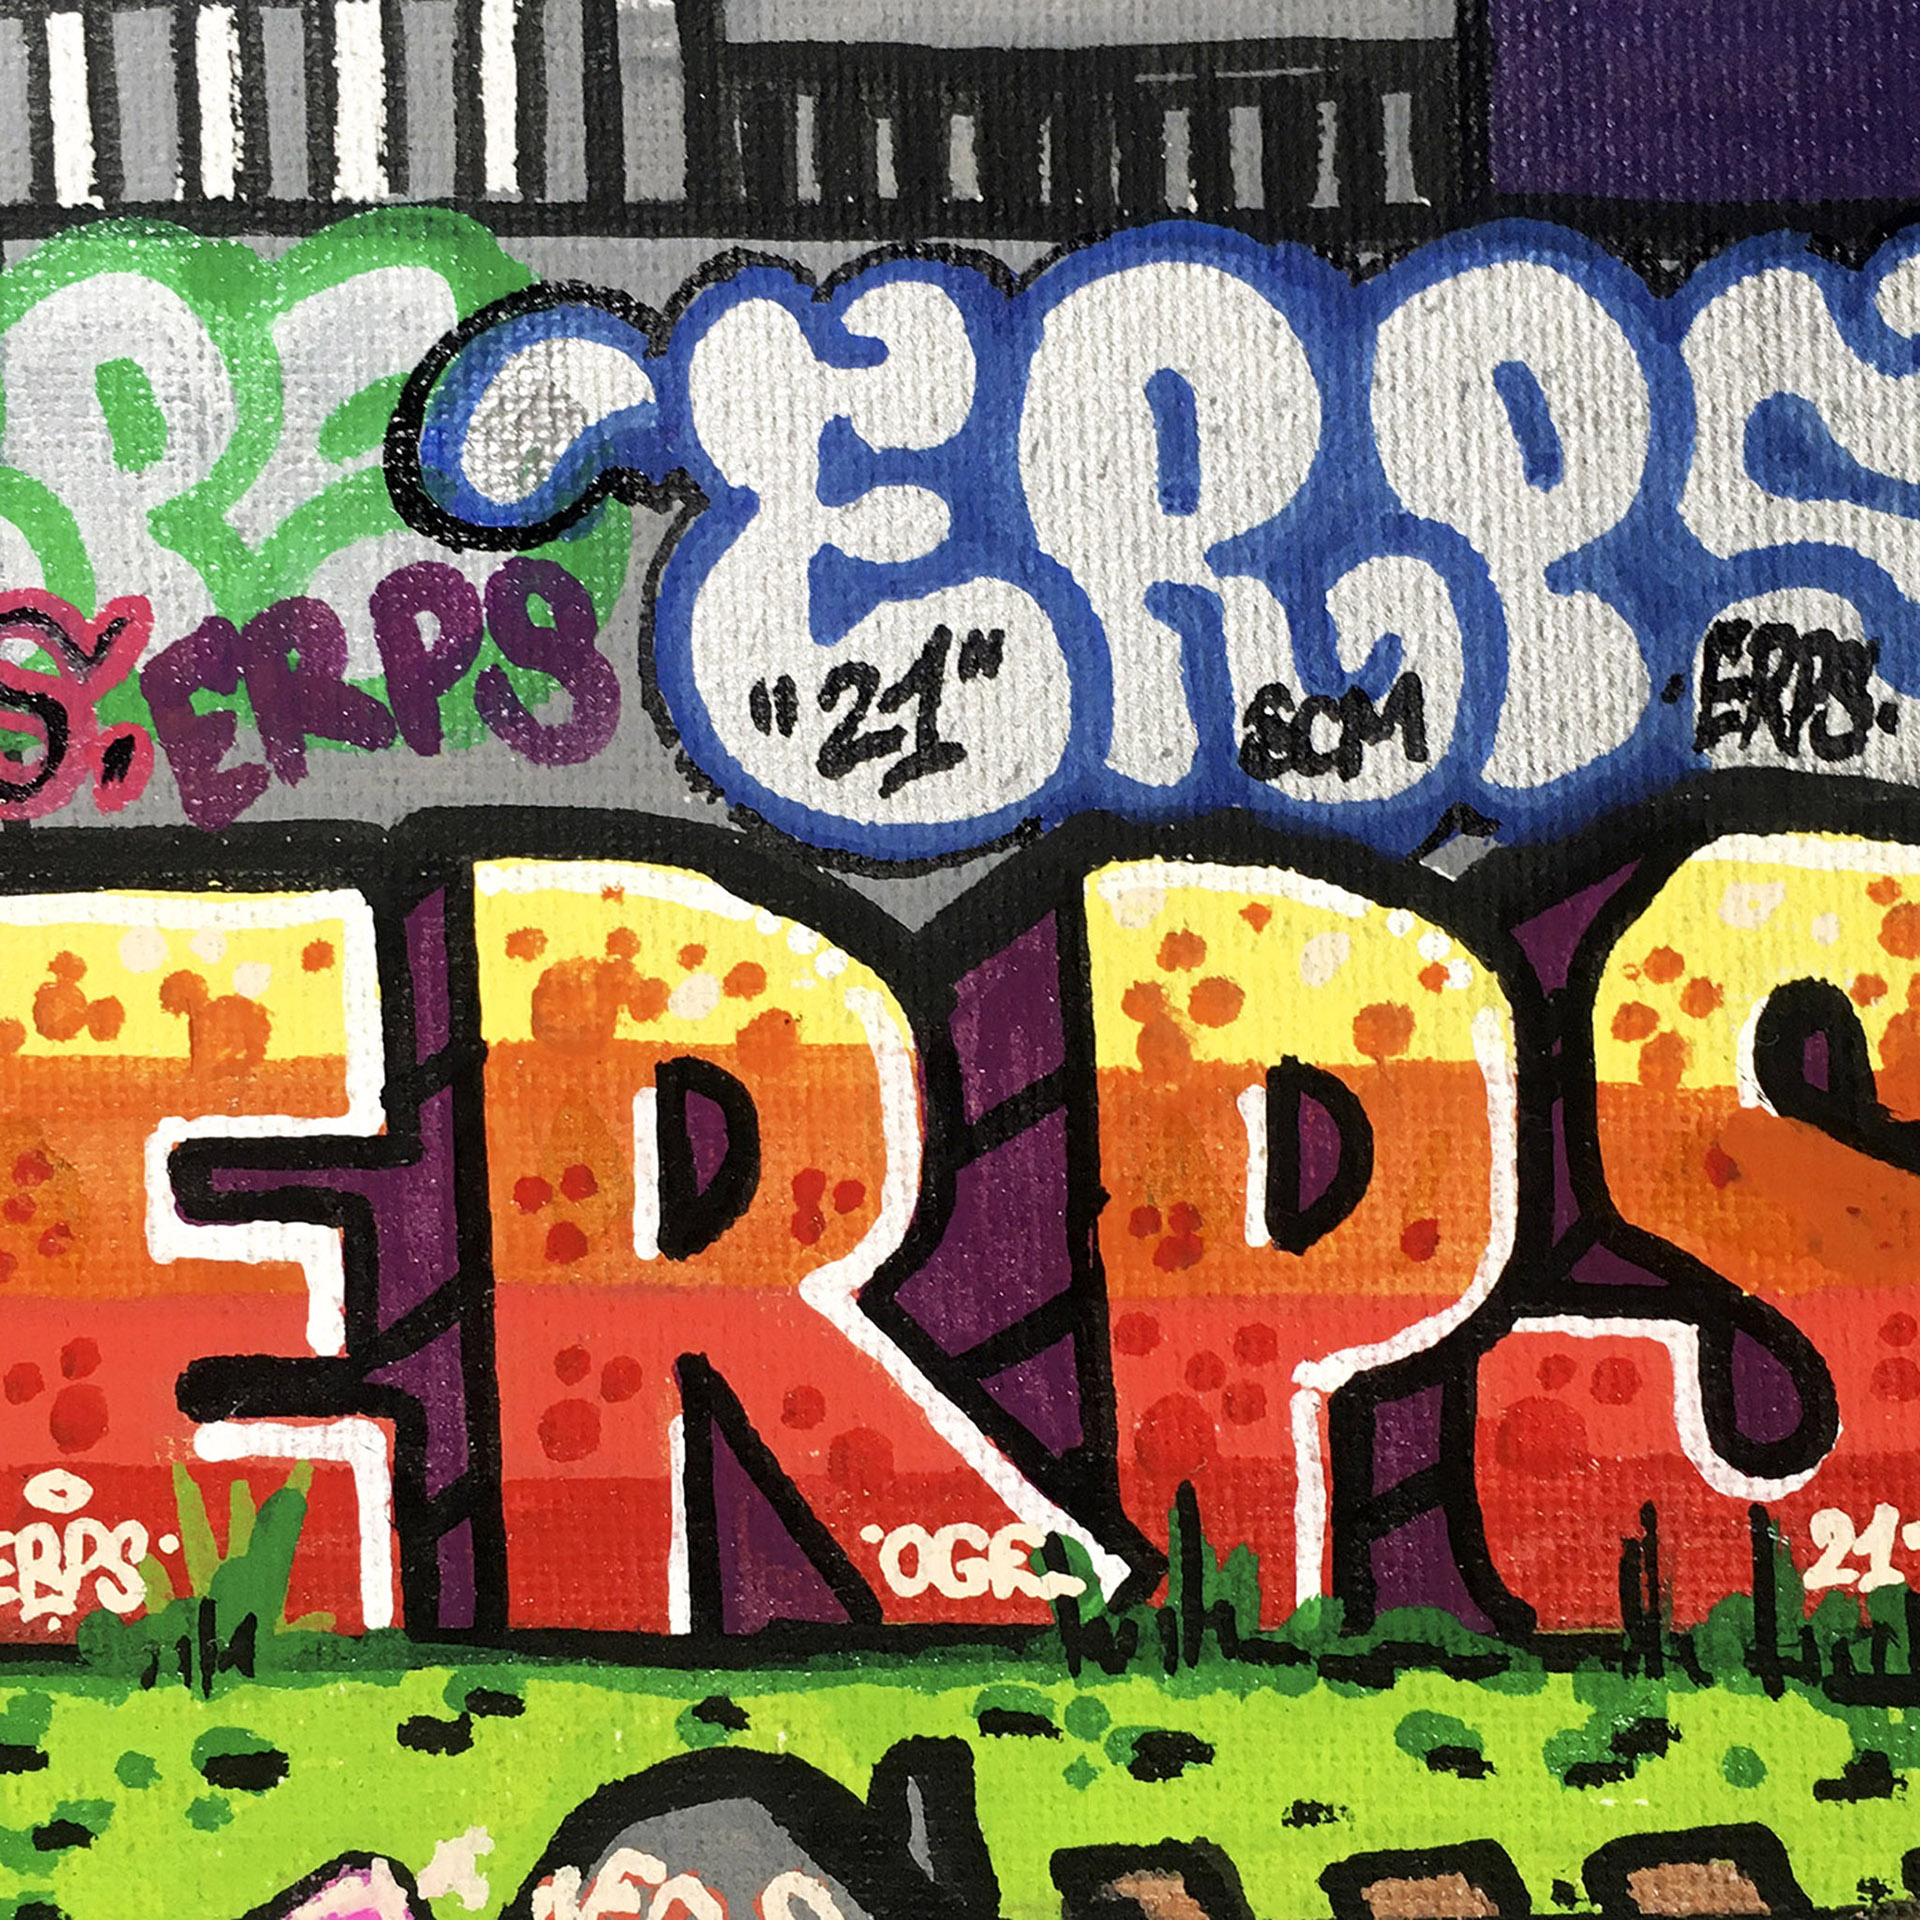 one of a kind artworkgraffiti legend erps • feederro